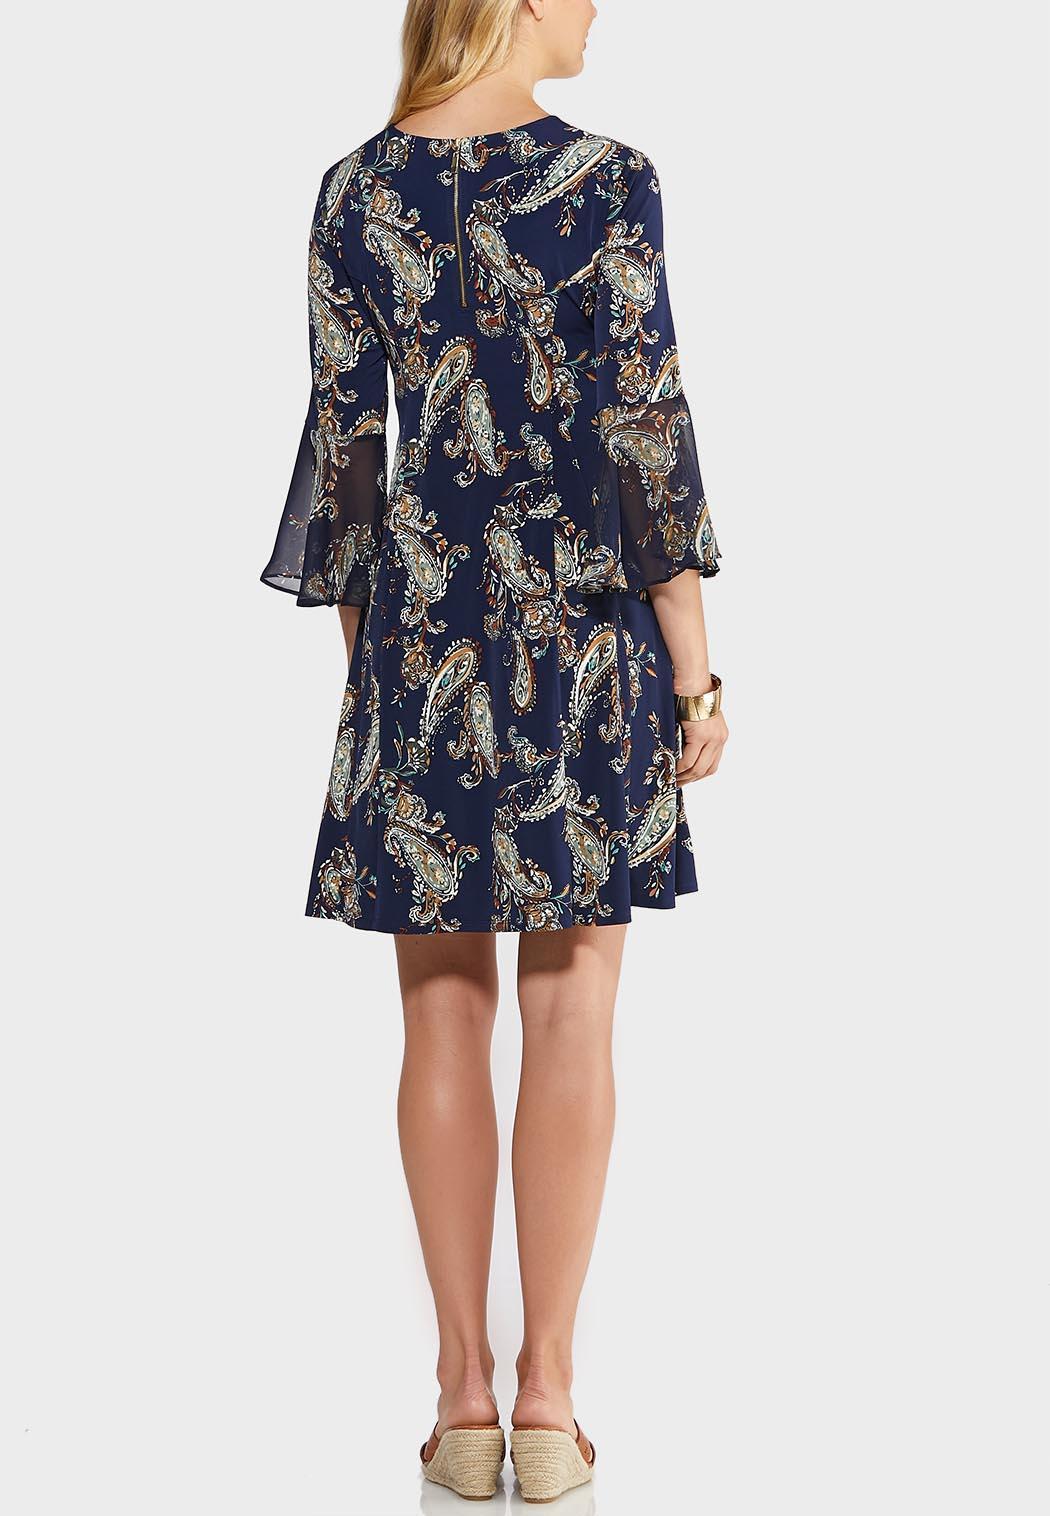 Paisley Bell Sleeve Swing Dress (Item #43947570)